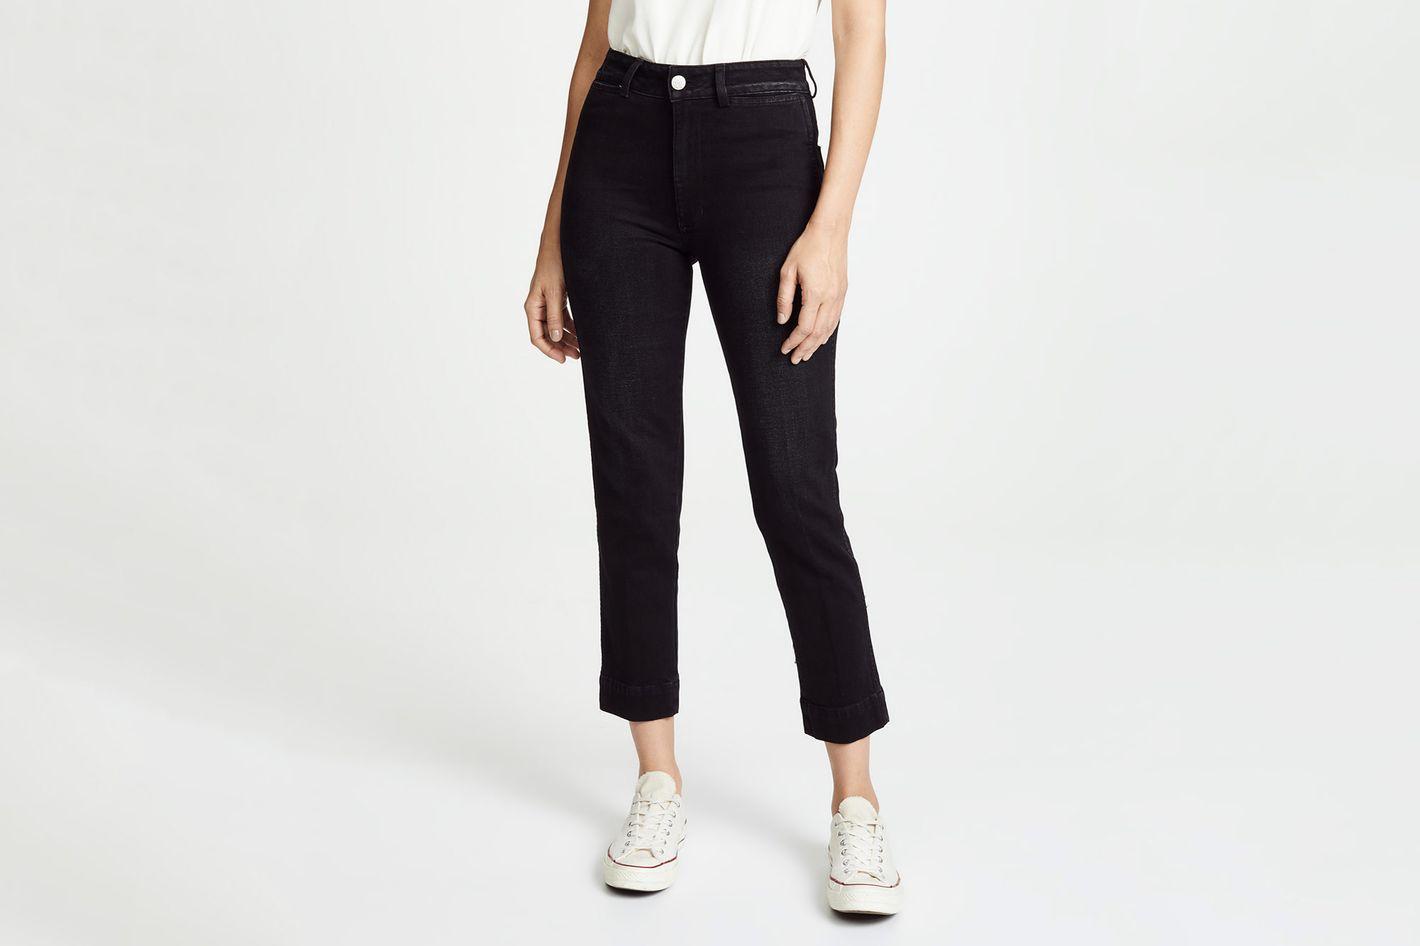 6235e237d1 Best High-Waisted Jeans for Women 2018